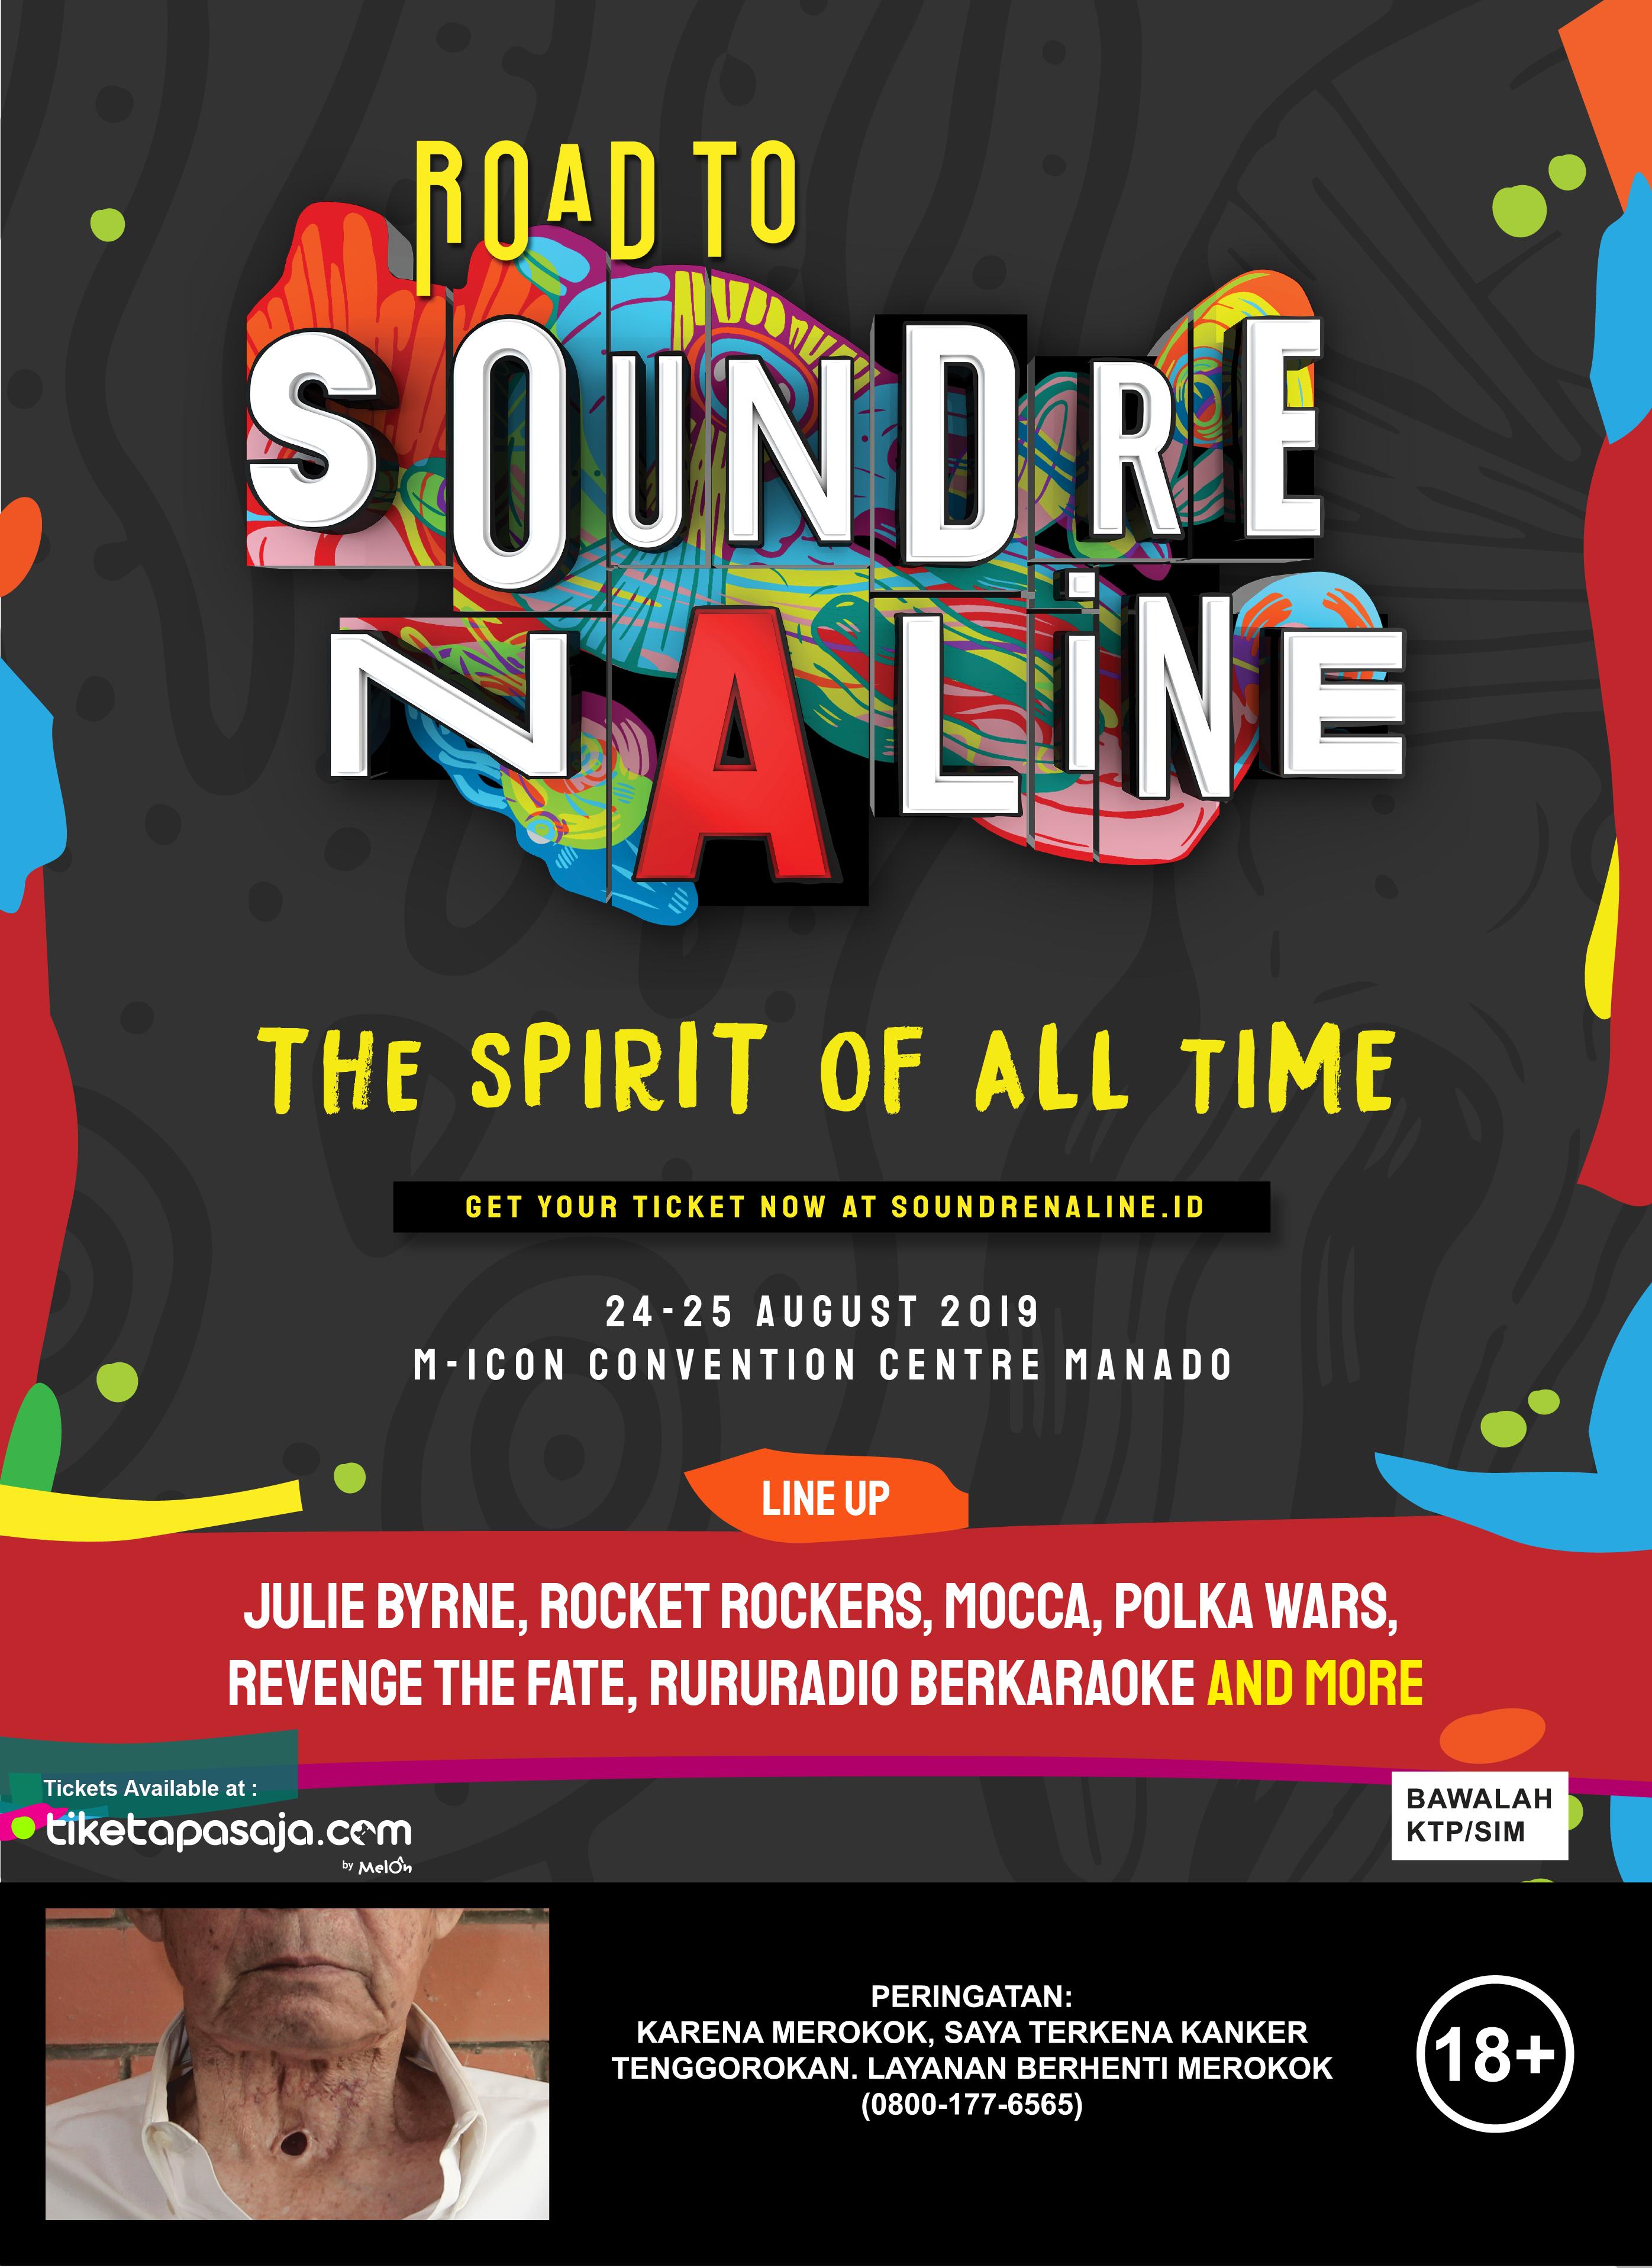 Road To Soundrenaline 2019 - MANADO